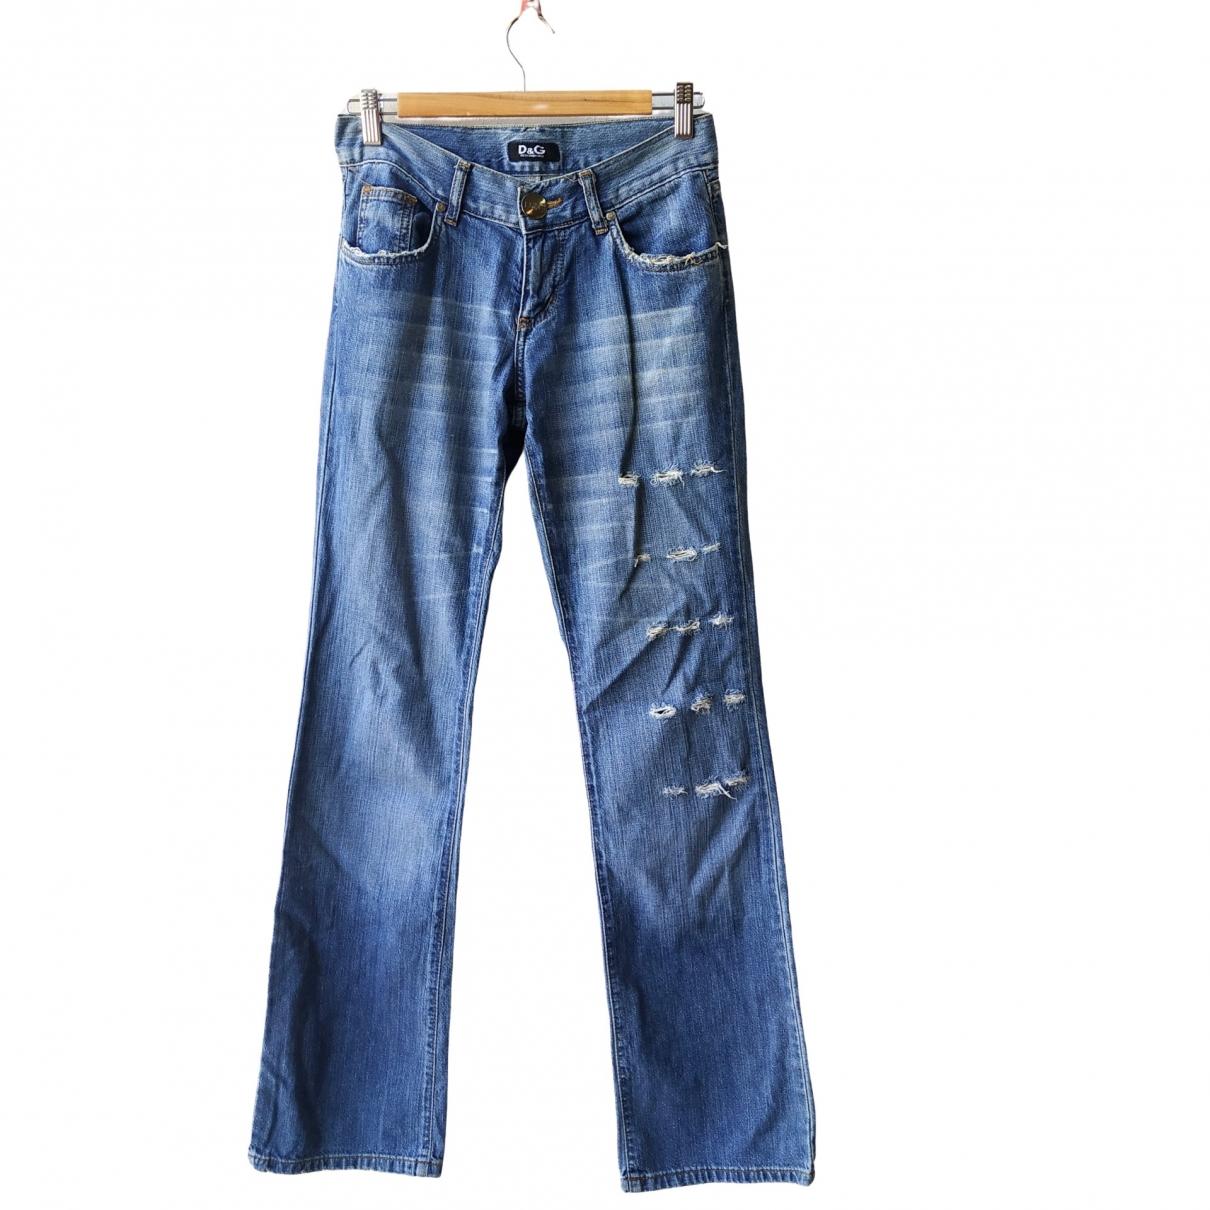 D&g \N Blue Denim - Jeans Jeans for Women 28 US